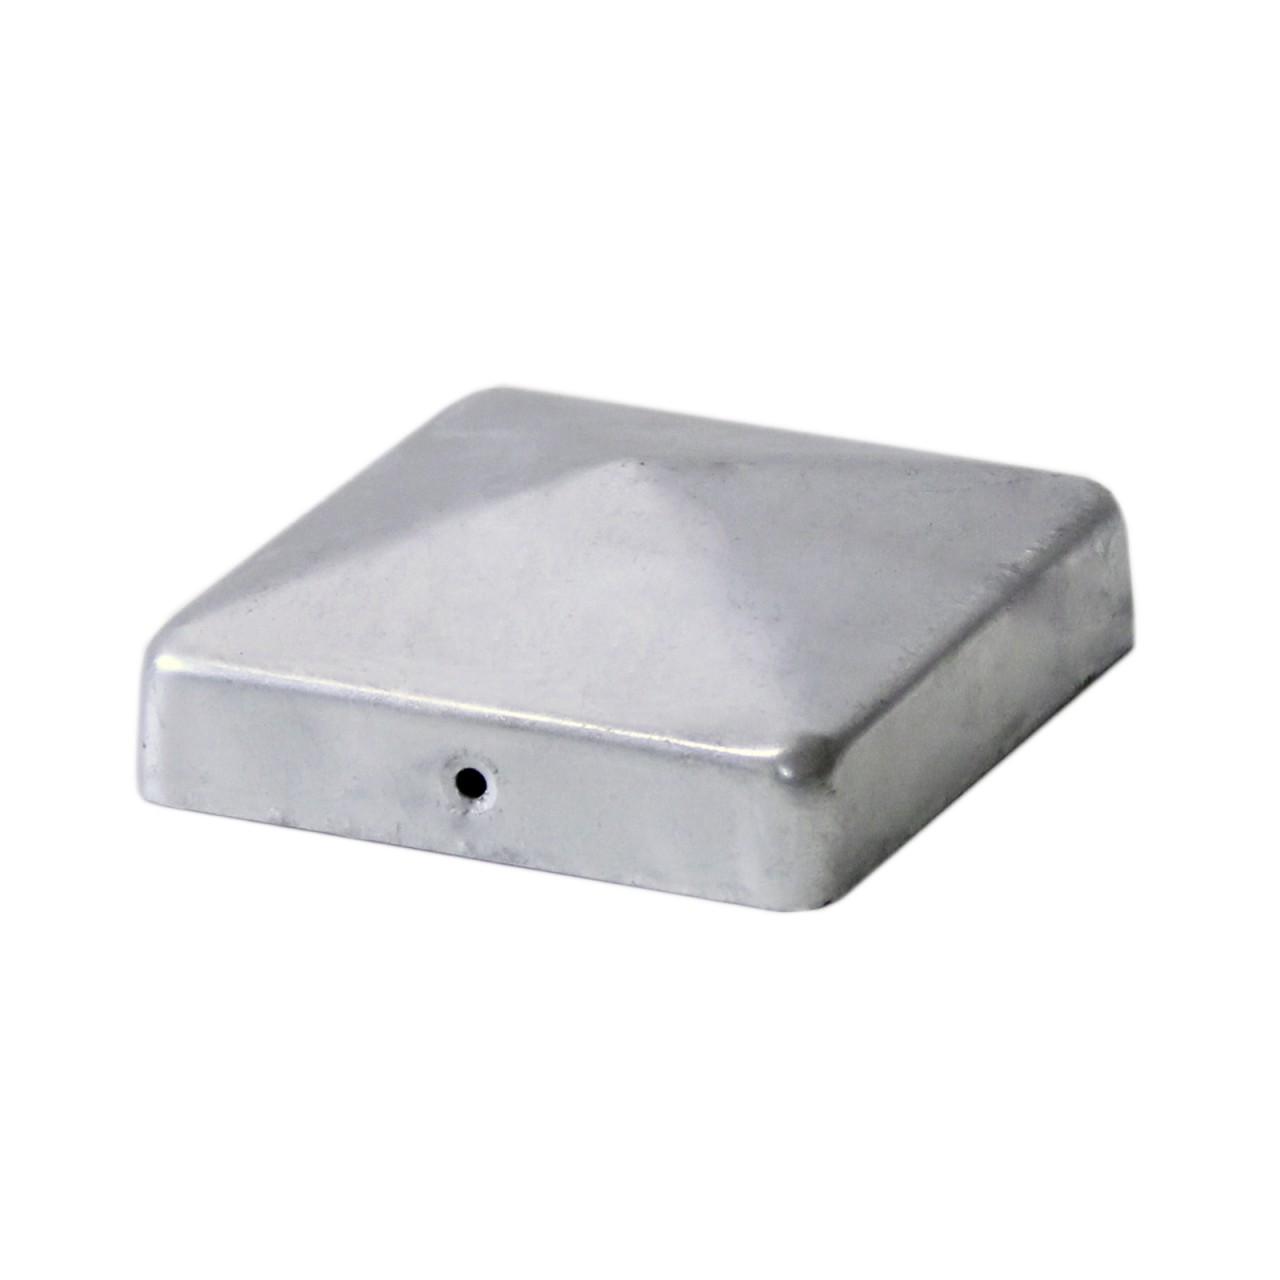 Pfostenkappe Pyramide 71 mm, 91 mm feuerverzinkt, Edelstahl - 71 mm feuerverzinkt